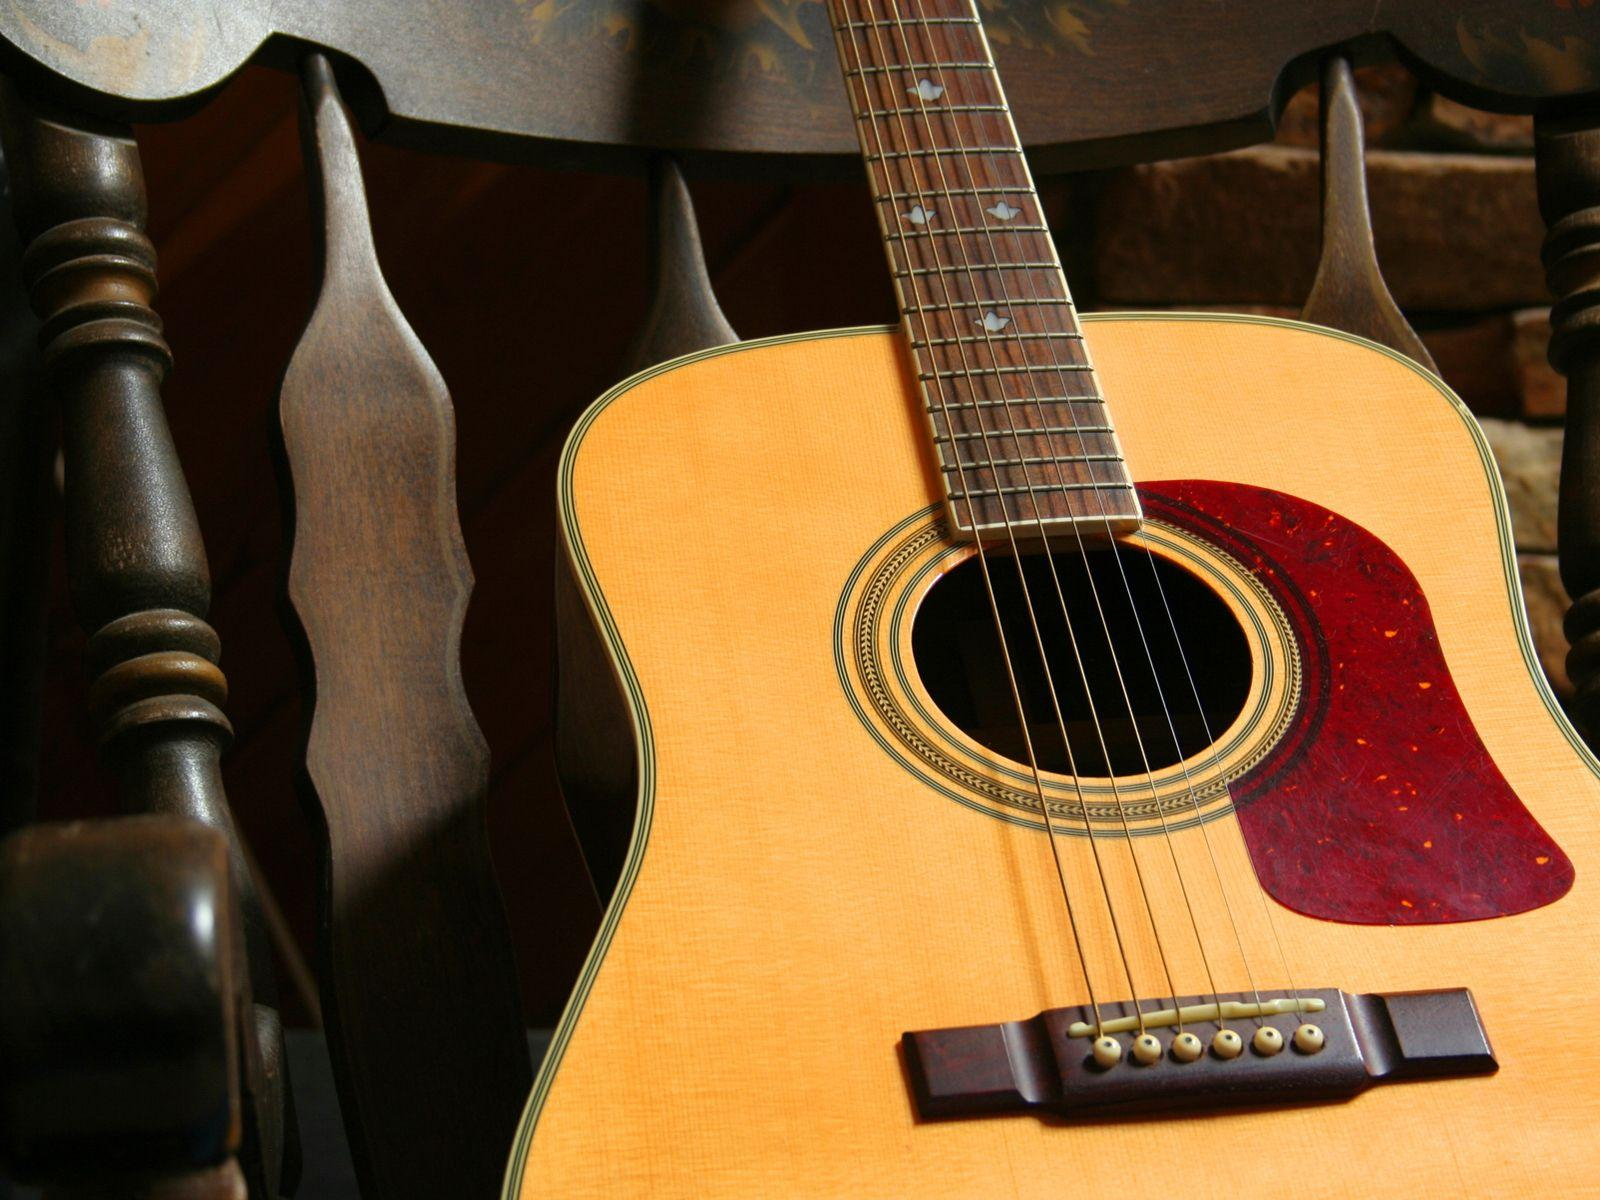 Martin Guitar Wallpapers - Wallpaper Cave